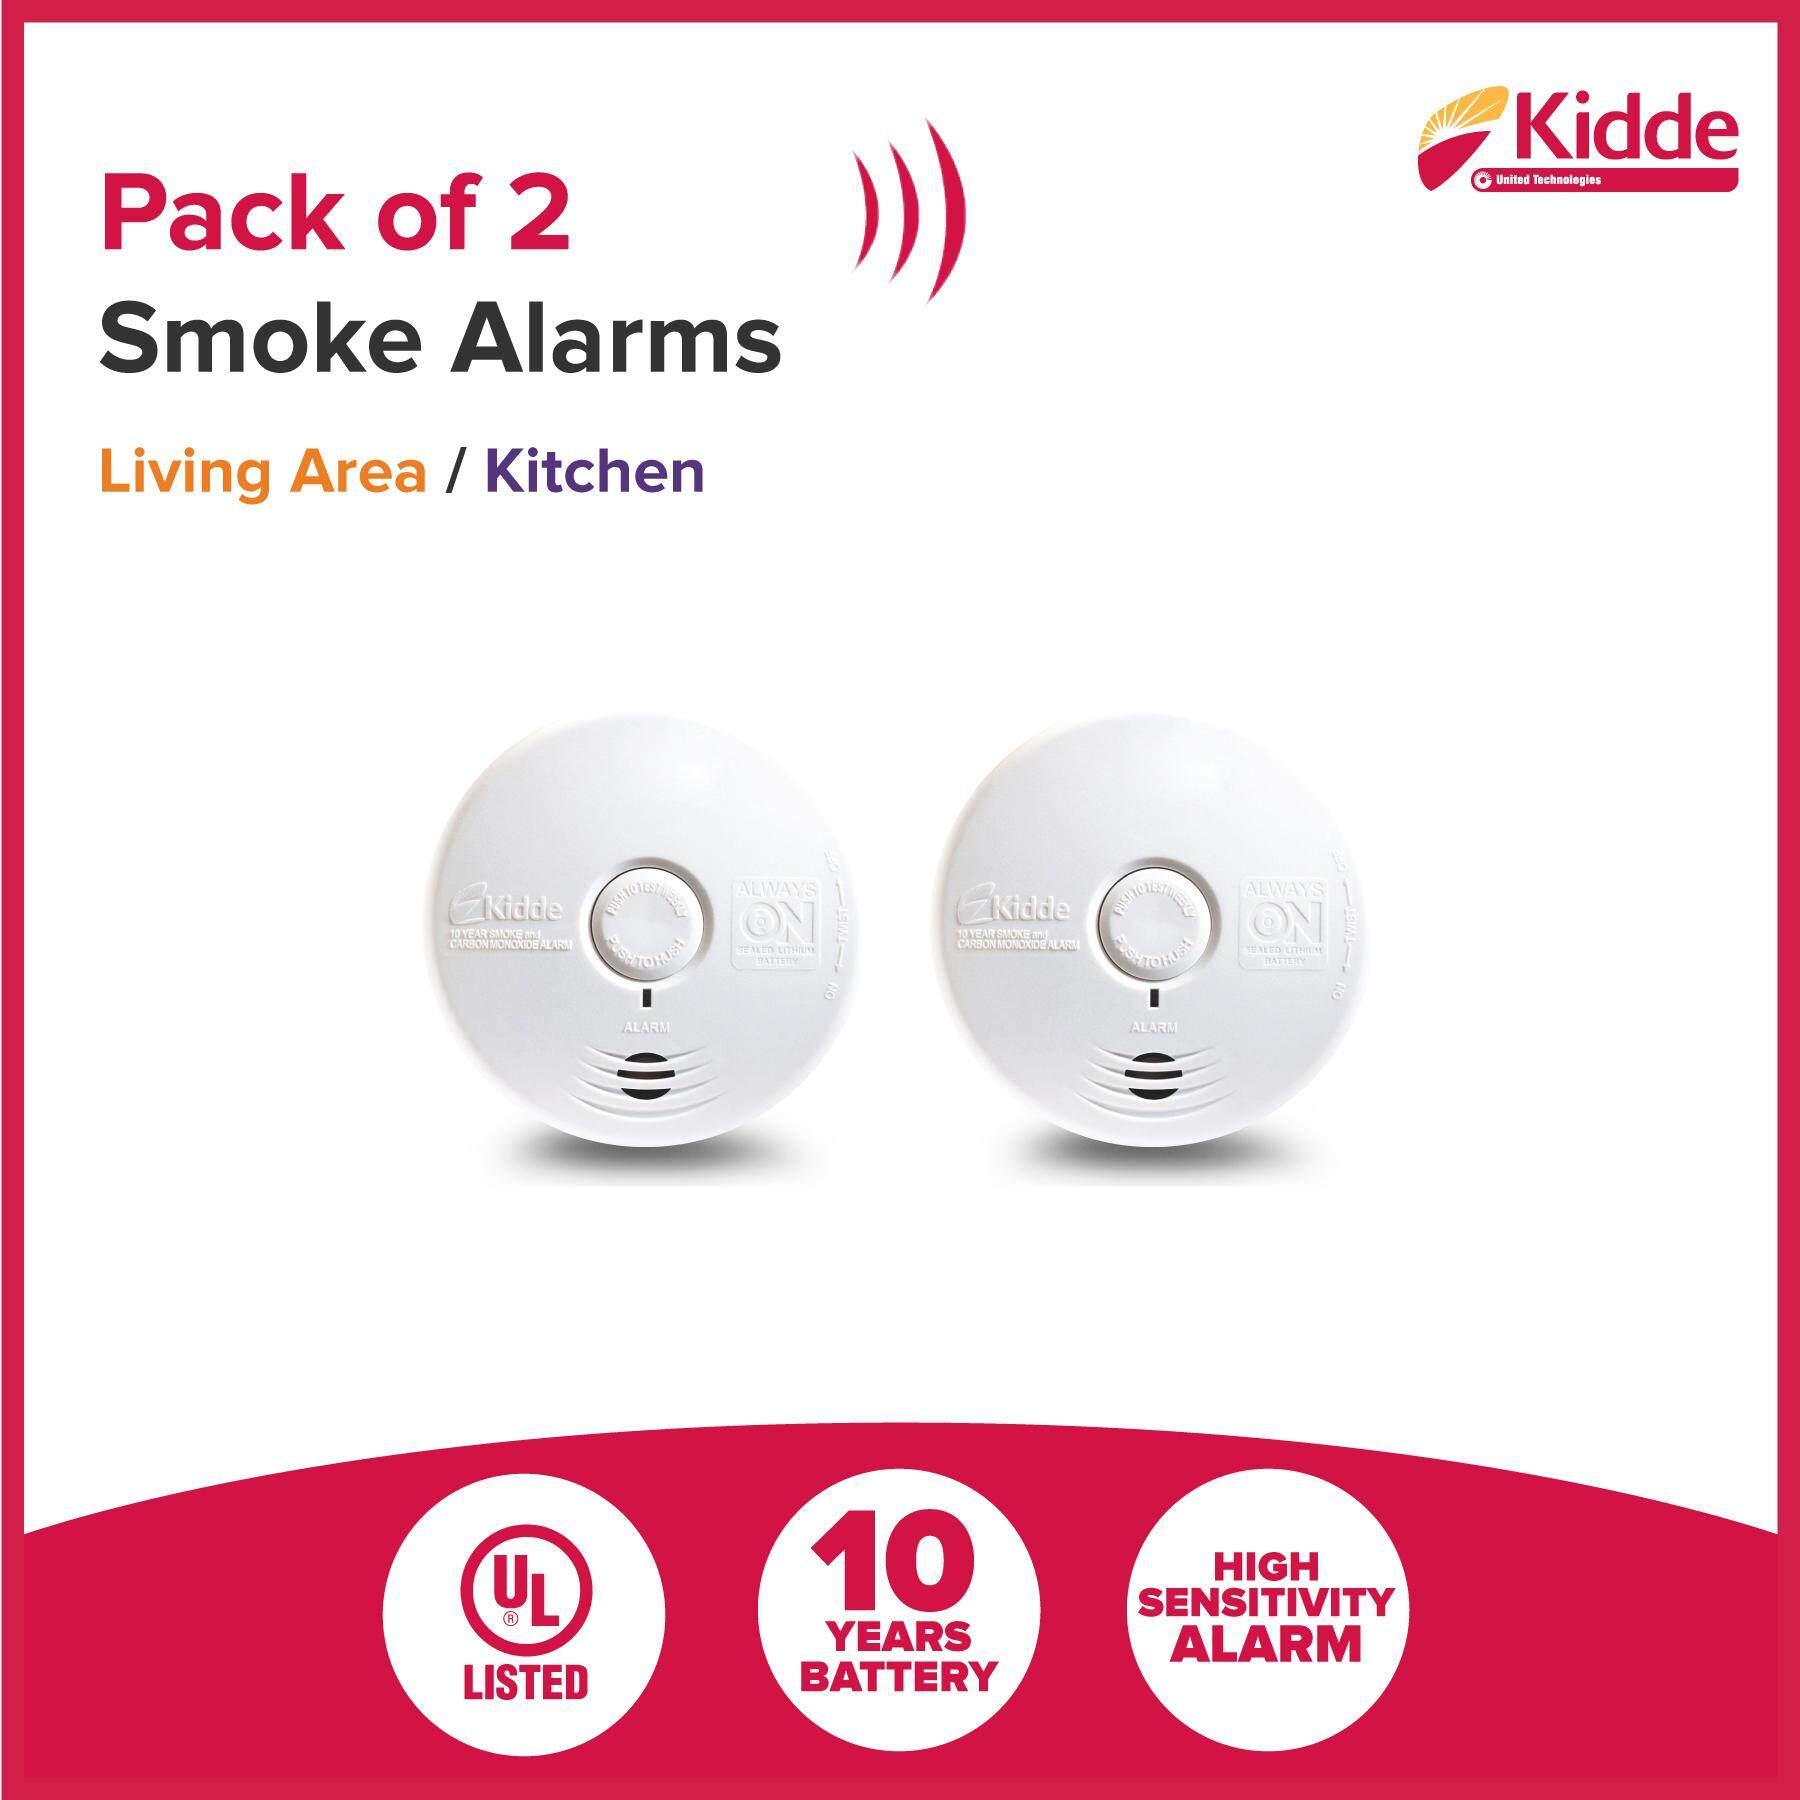 KIDDE Smoke Alarm Detector set (Smoke Alarm + Smoke & CO)  [Pack of 2], 10 Years Battery, UL listed